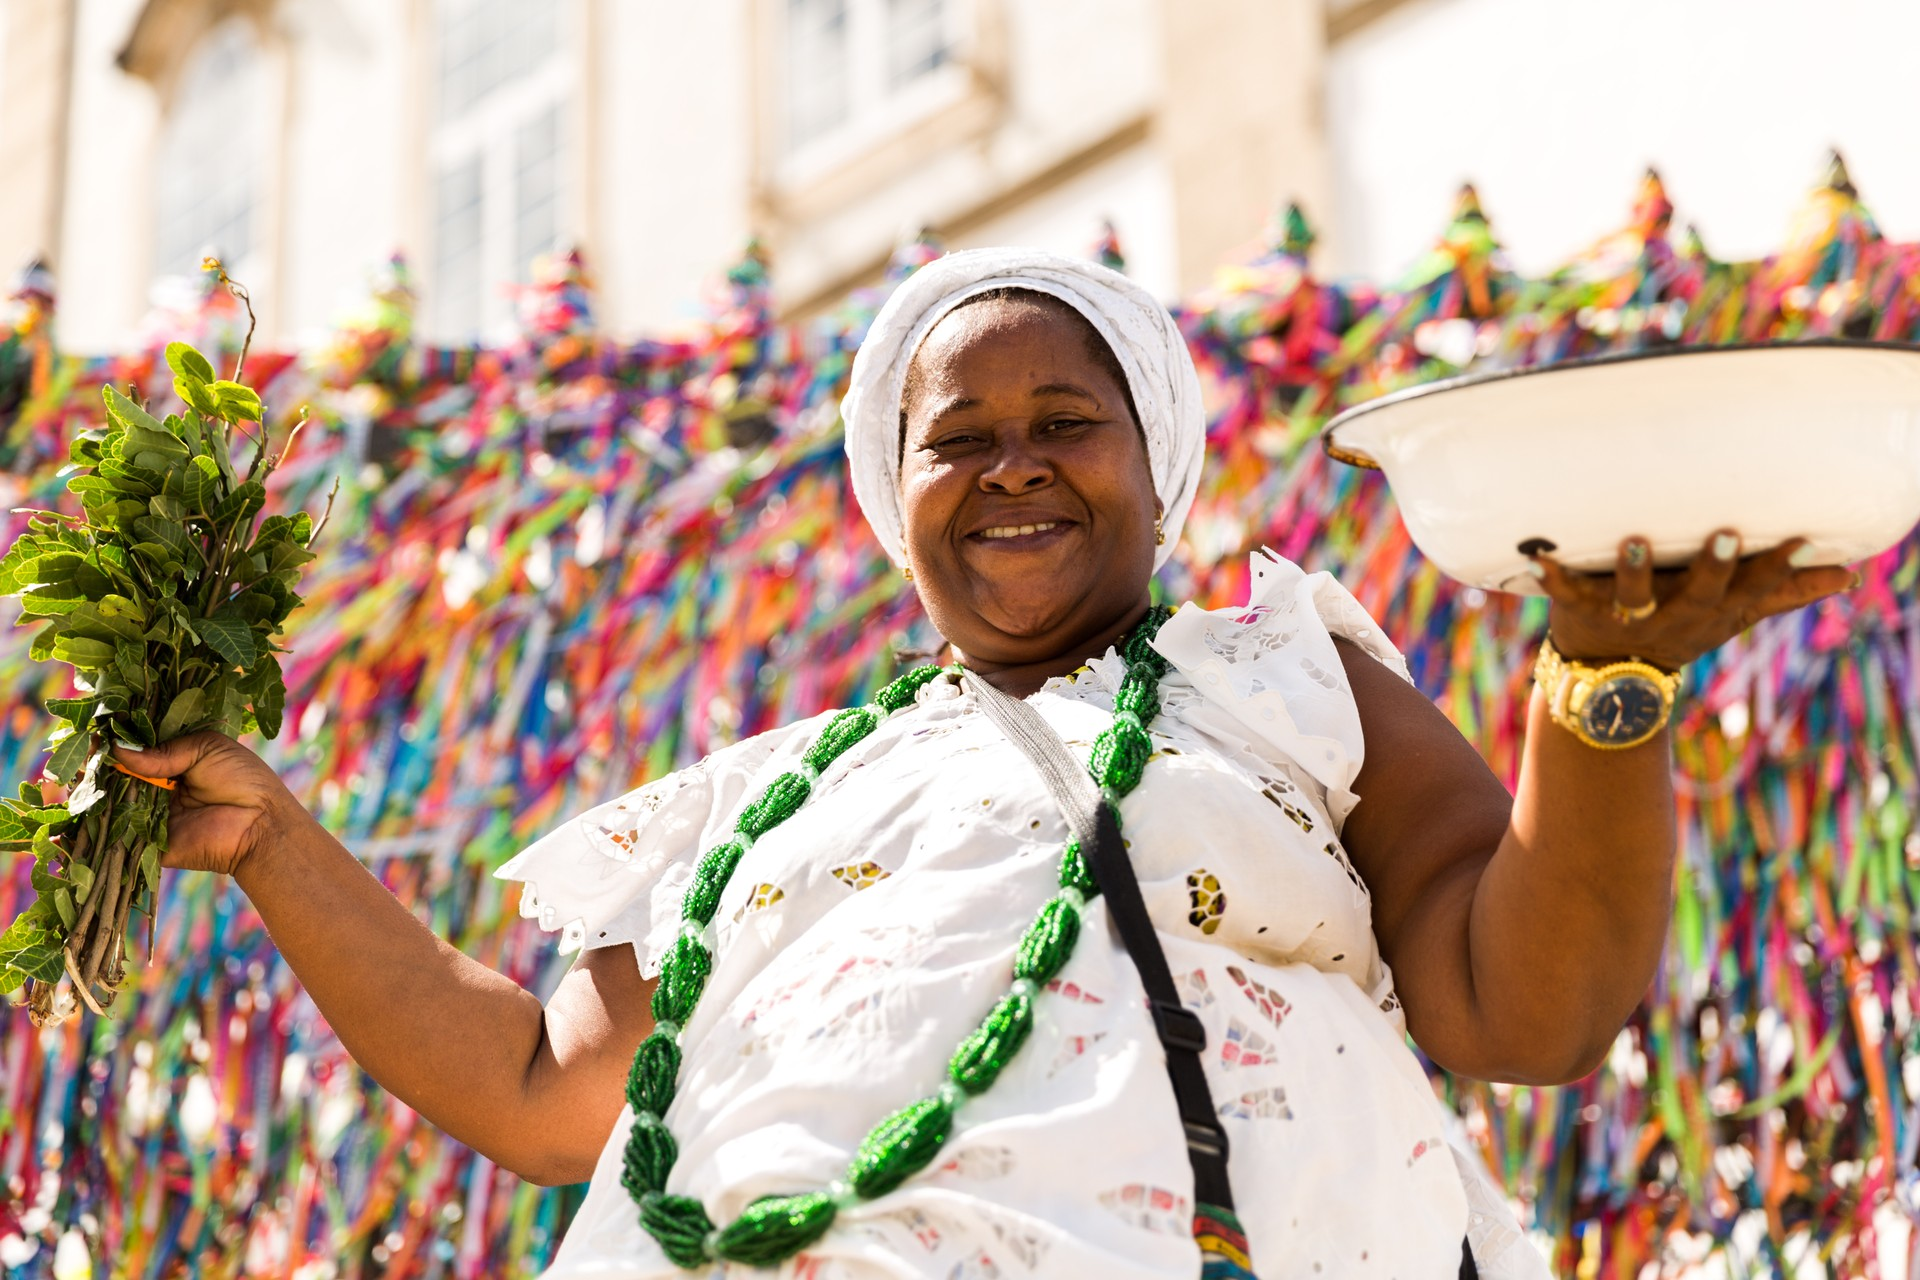 Lady celebrating in Salvador